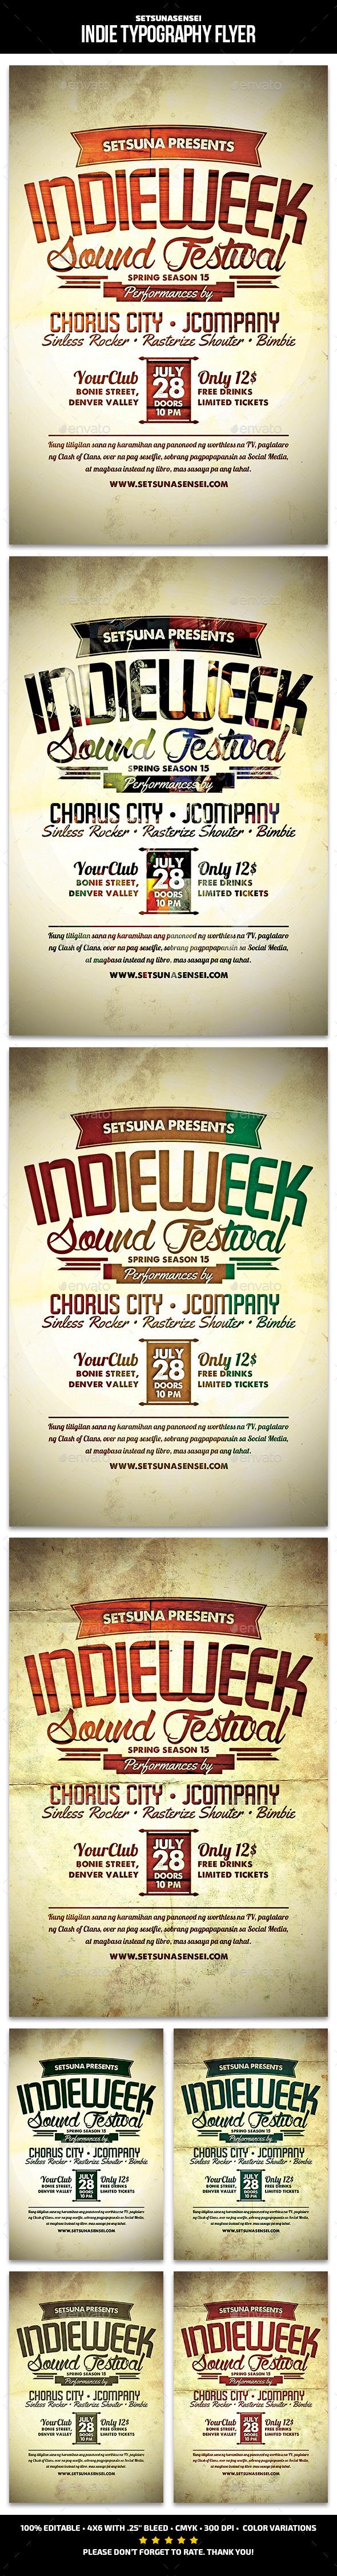 Indie Typography Flyer - Concerts Events